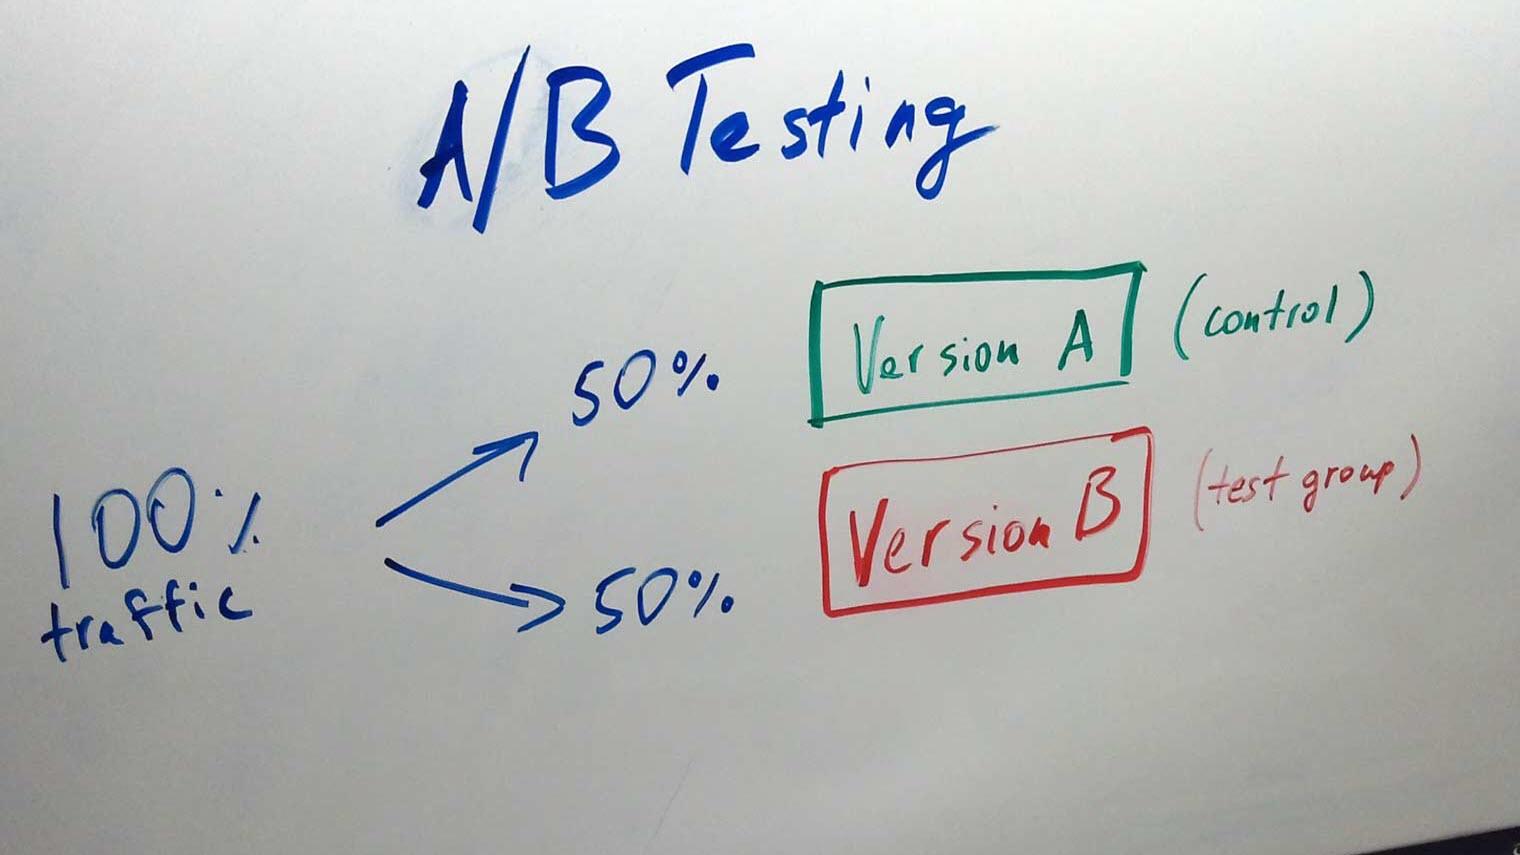 B2B_Web_Design-ab-testing